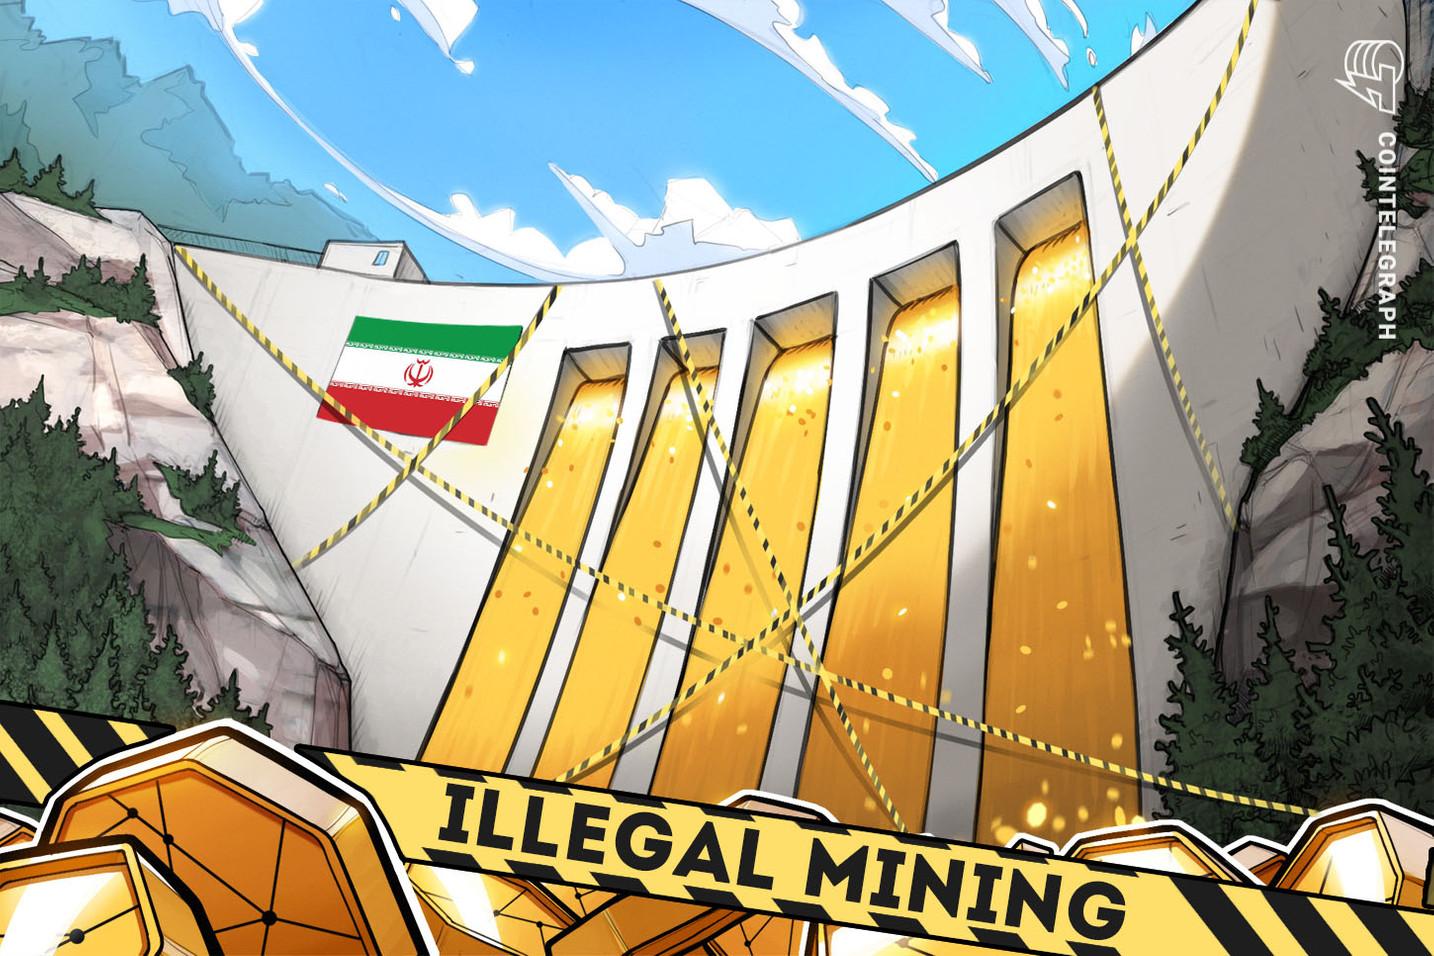 Irán ofrece recompensa por operaciones ilícitas de minería de criptomonedas